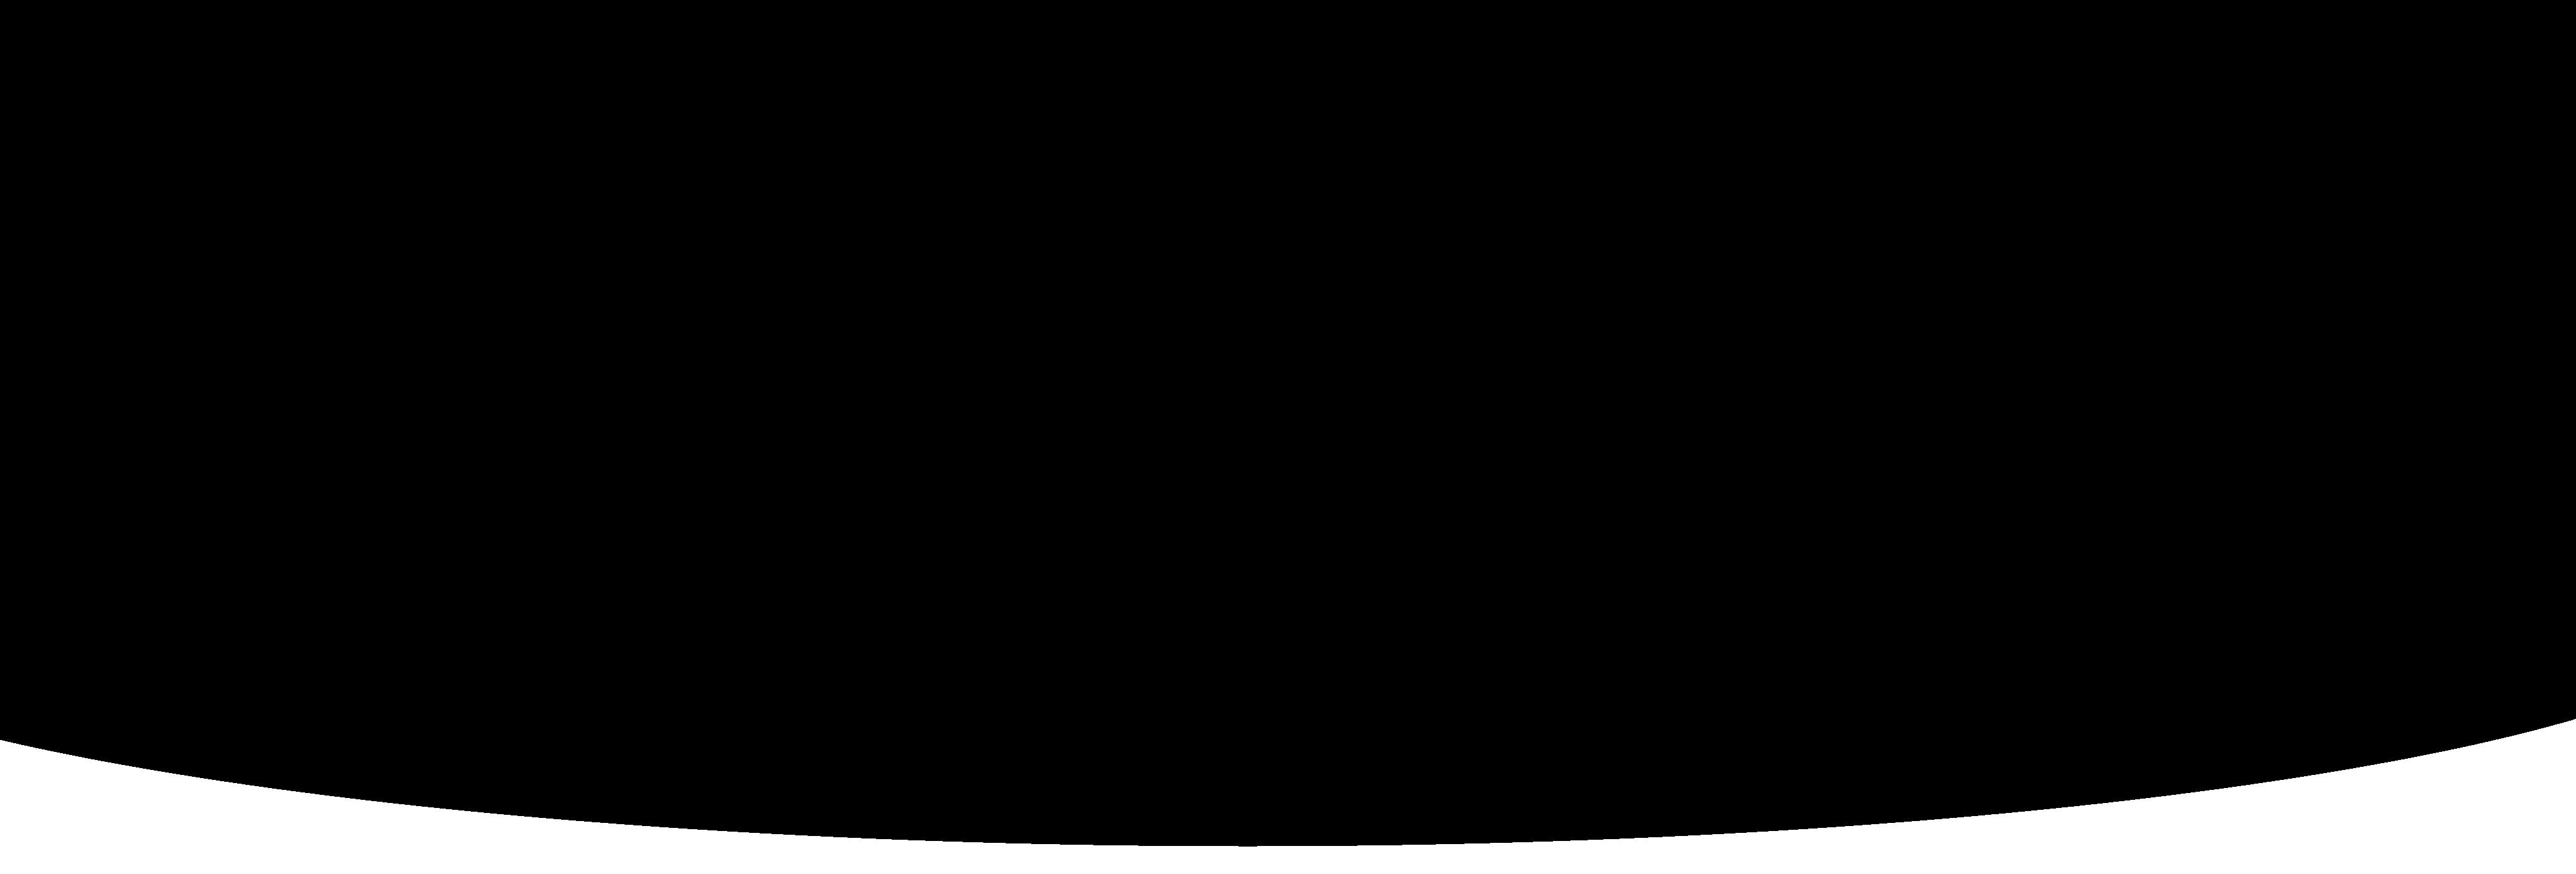 White border Plate